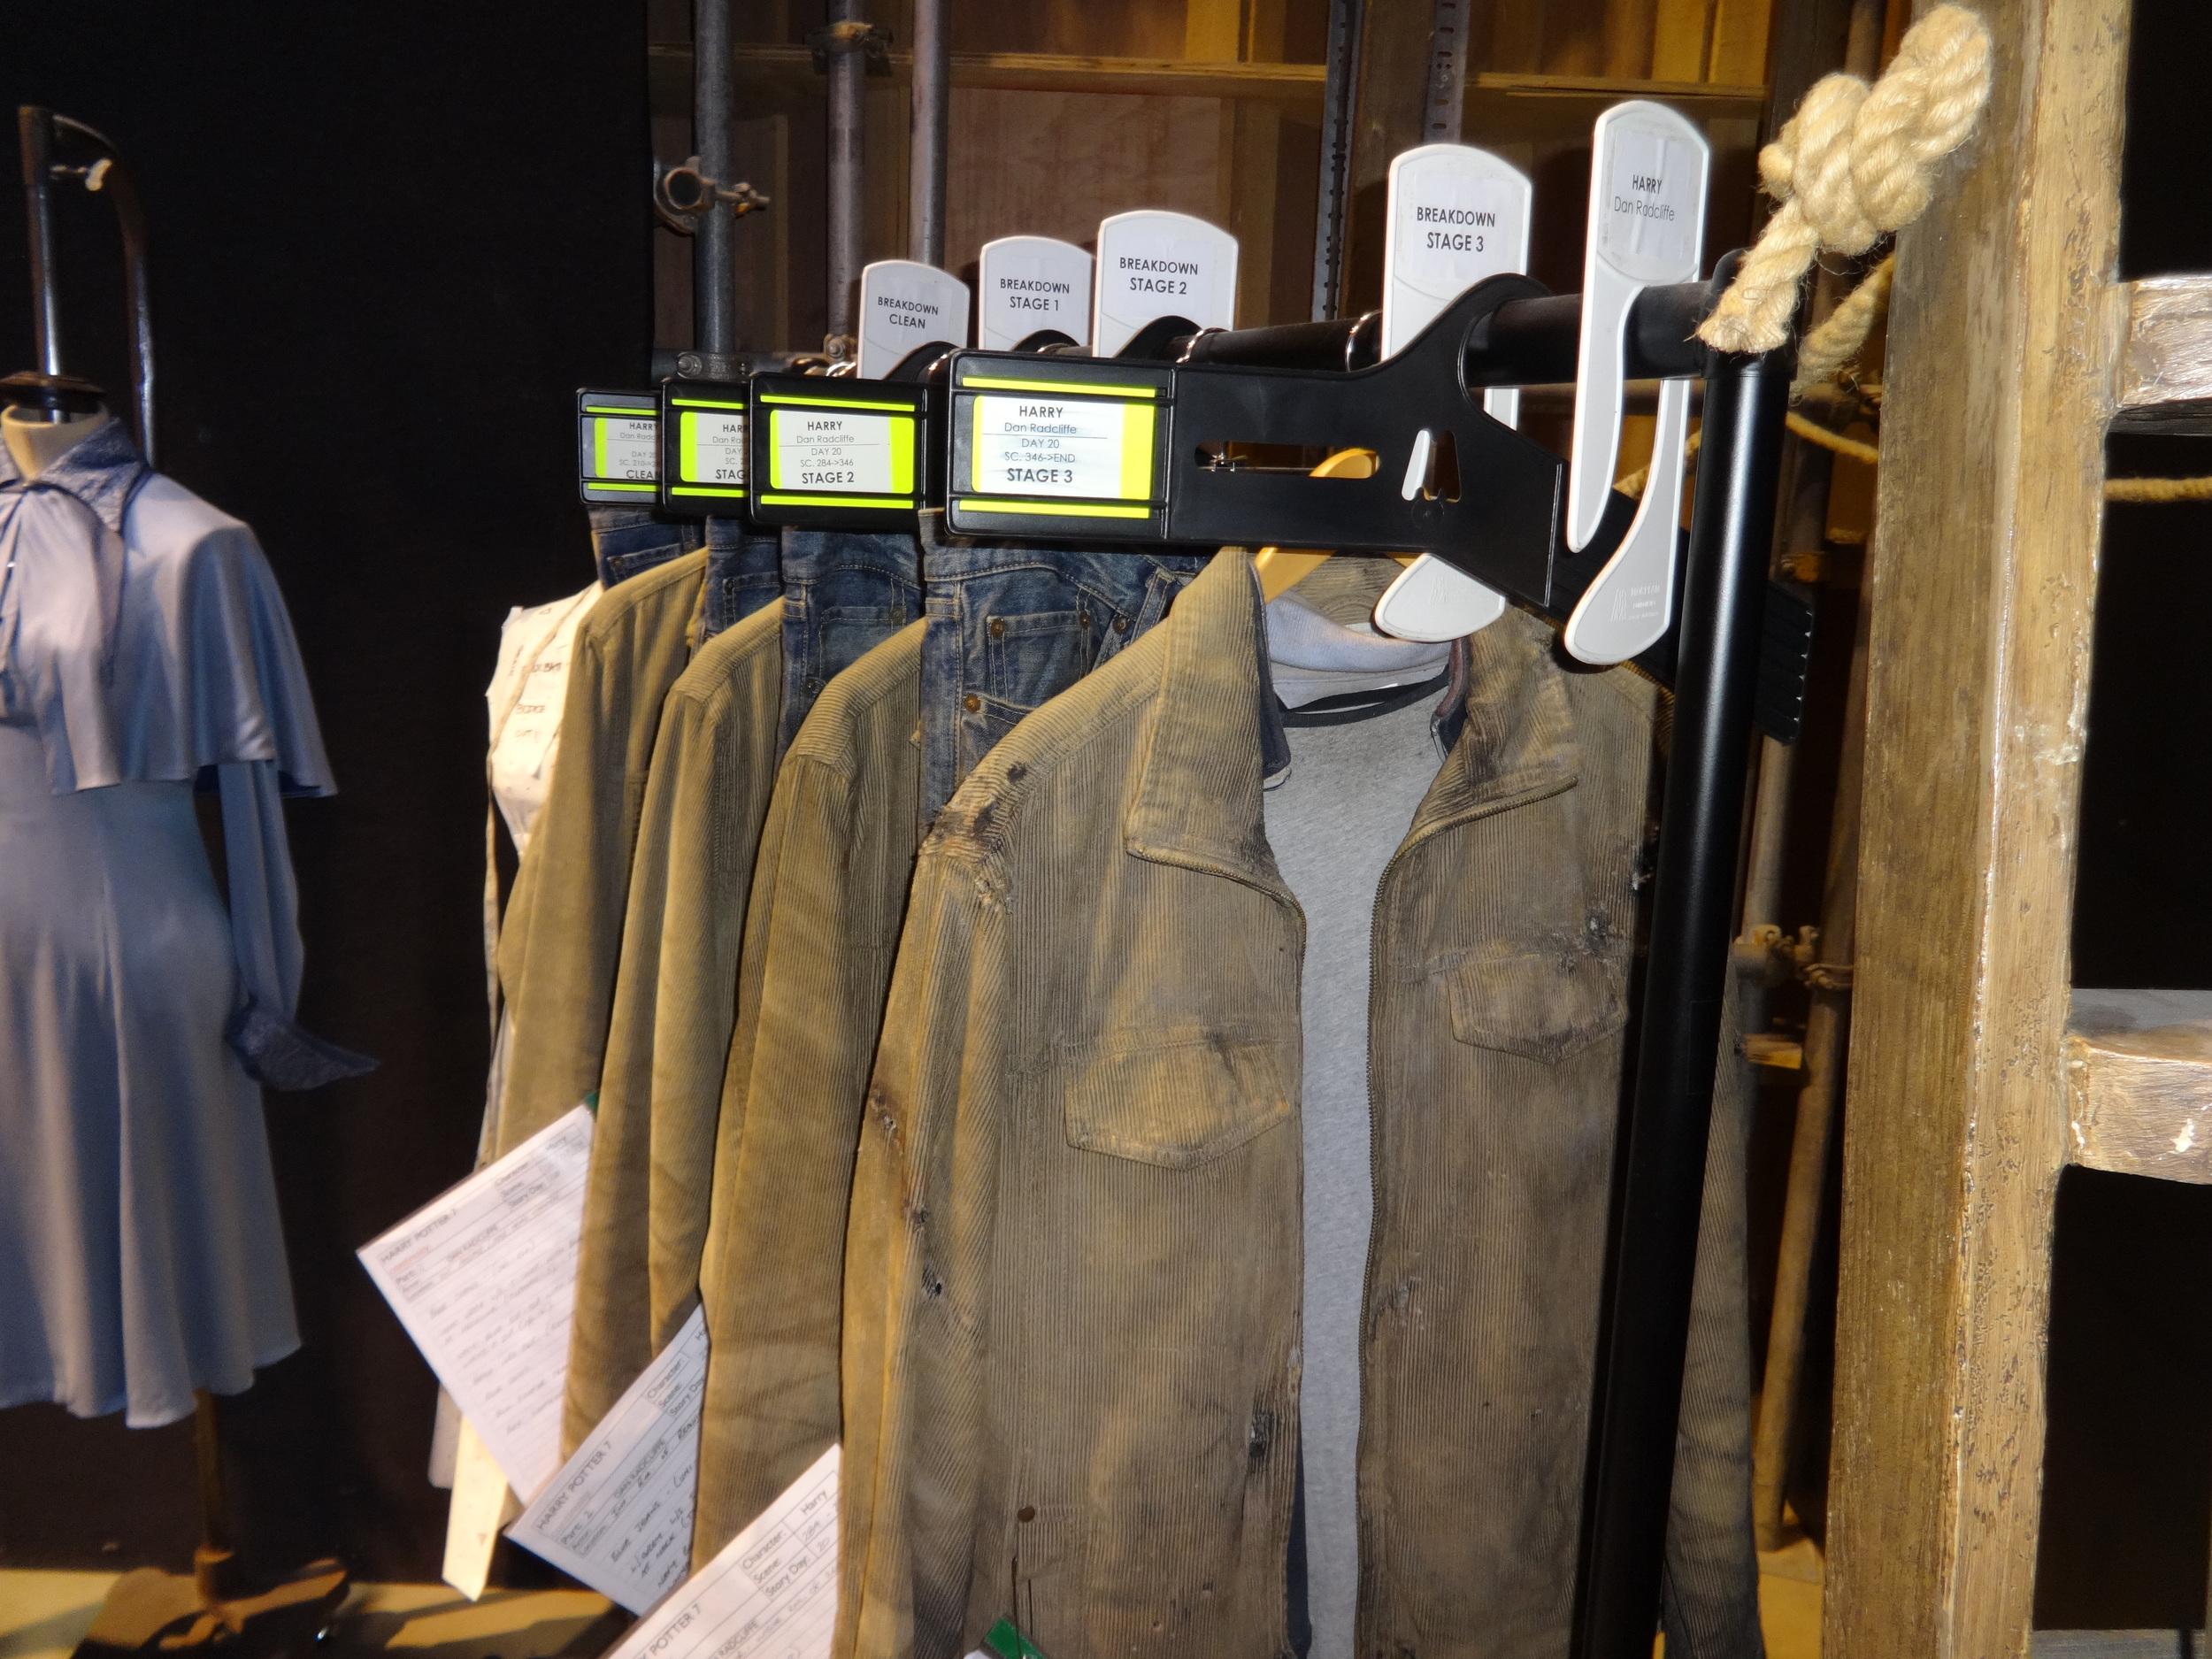 hogwarts - harry's clothes